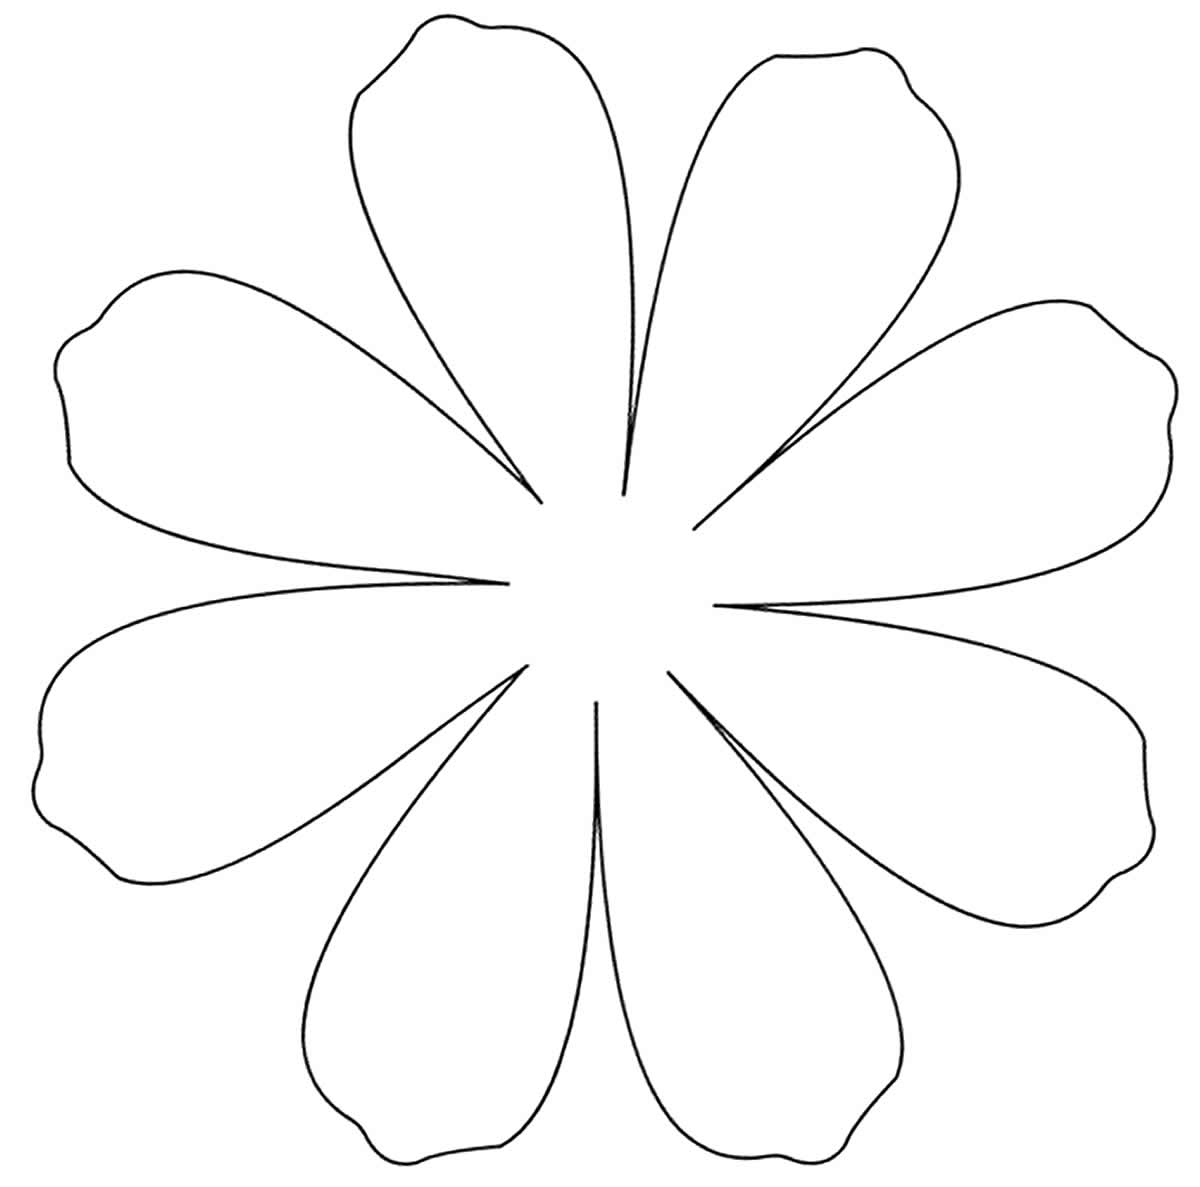 Petal molds for paper flowers